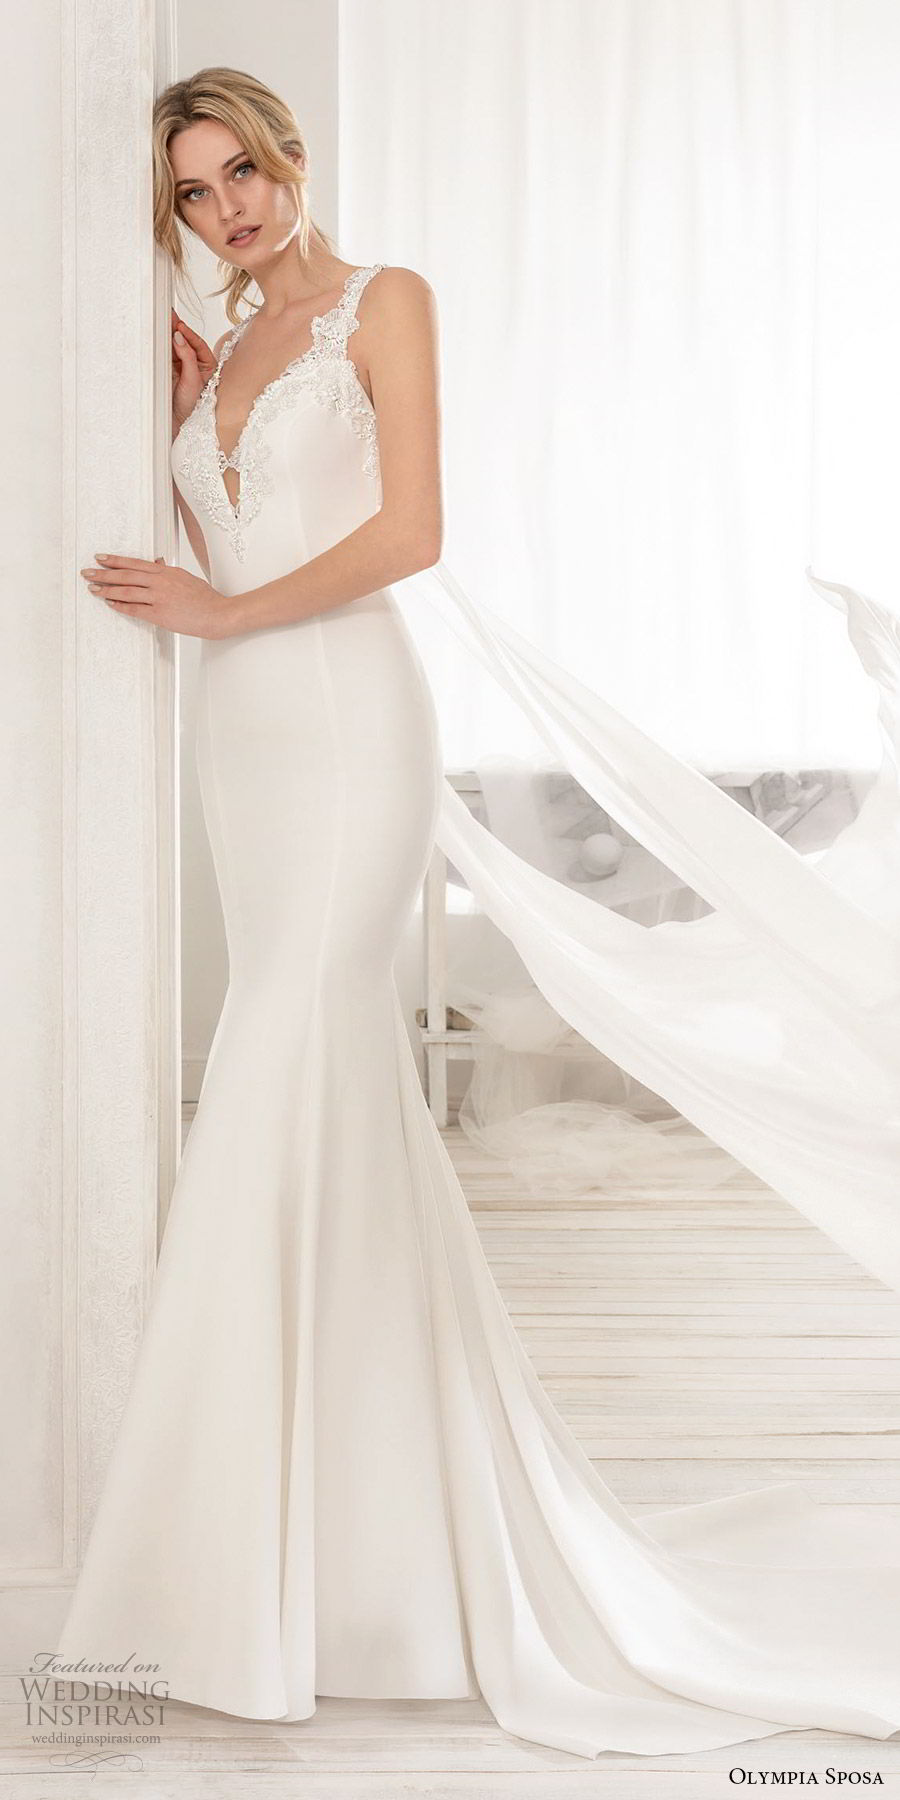 olympia sposa 2020 bridal sleeveless thick lace straps embellisshed deep v neckline keyhole mermaid wedding dress (3) elegant sleek clean back watteau chapel train mv